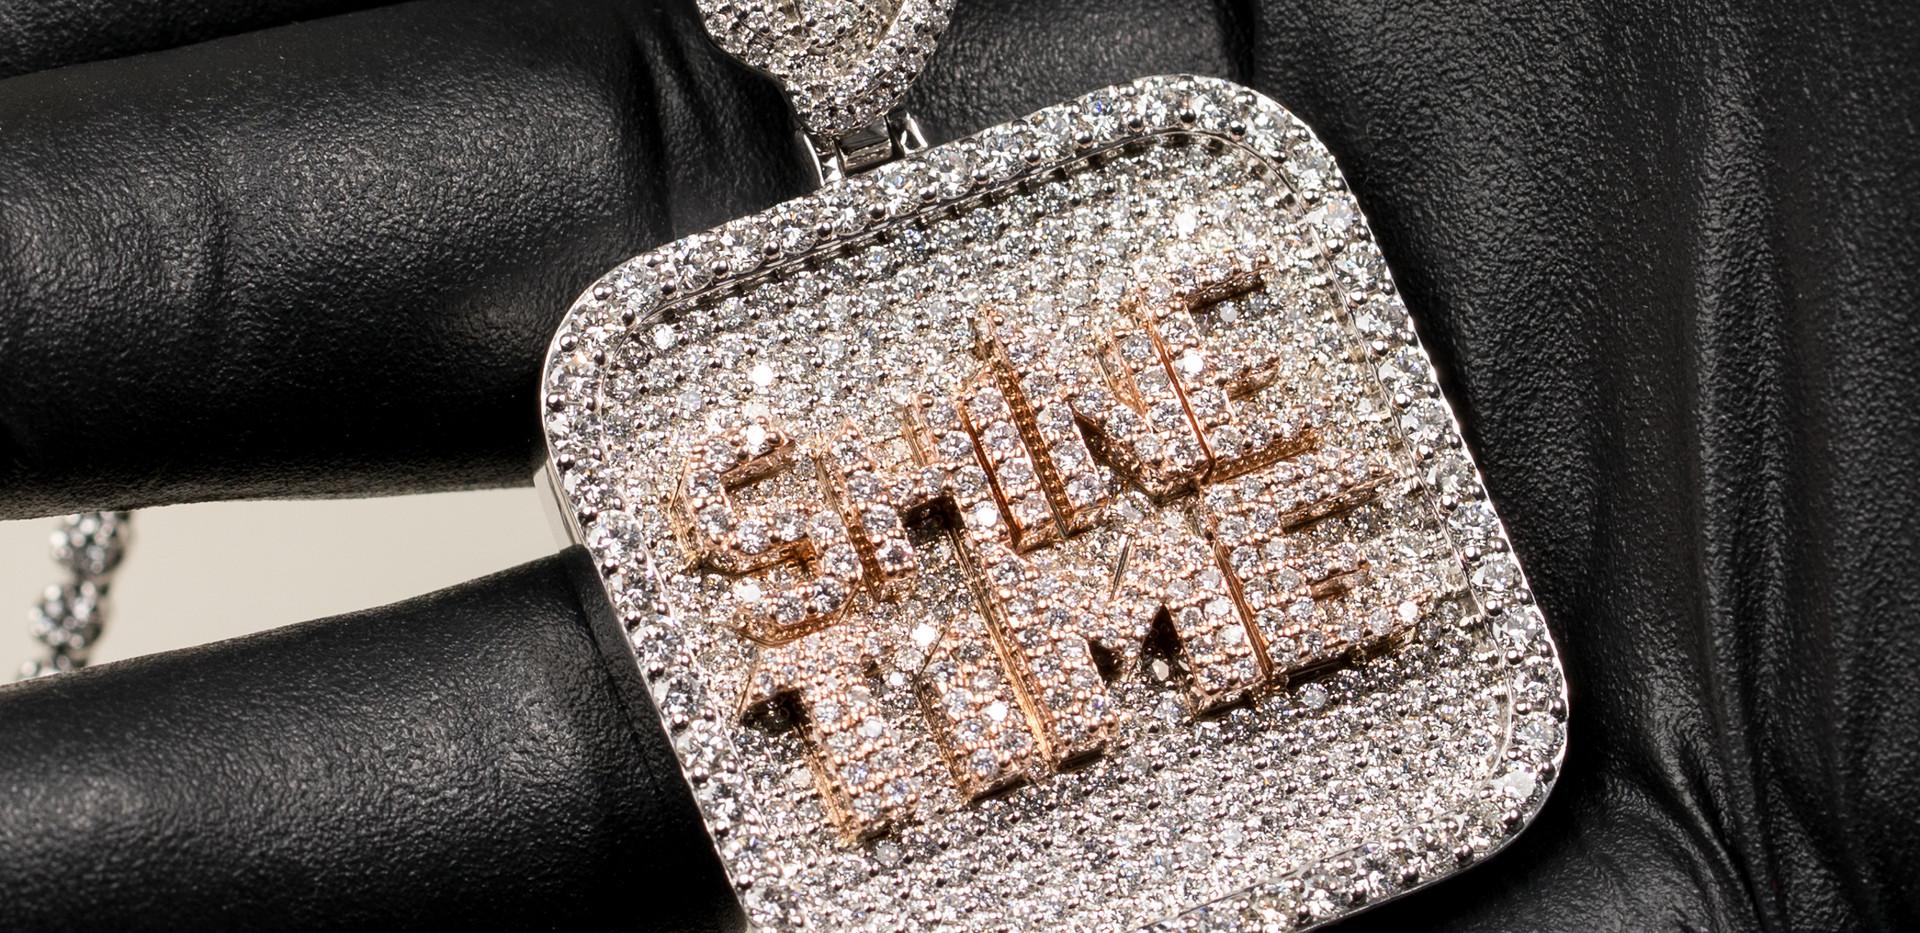 Shine Time Pendant Designed By. Tim Da Jeweler